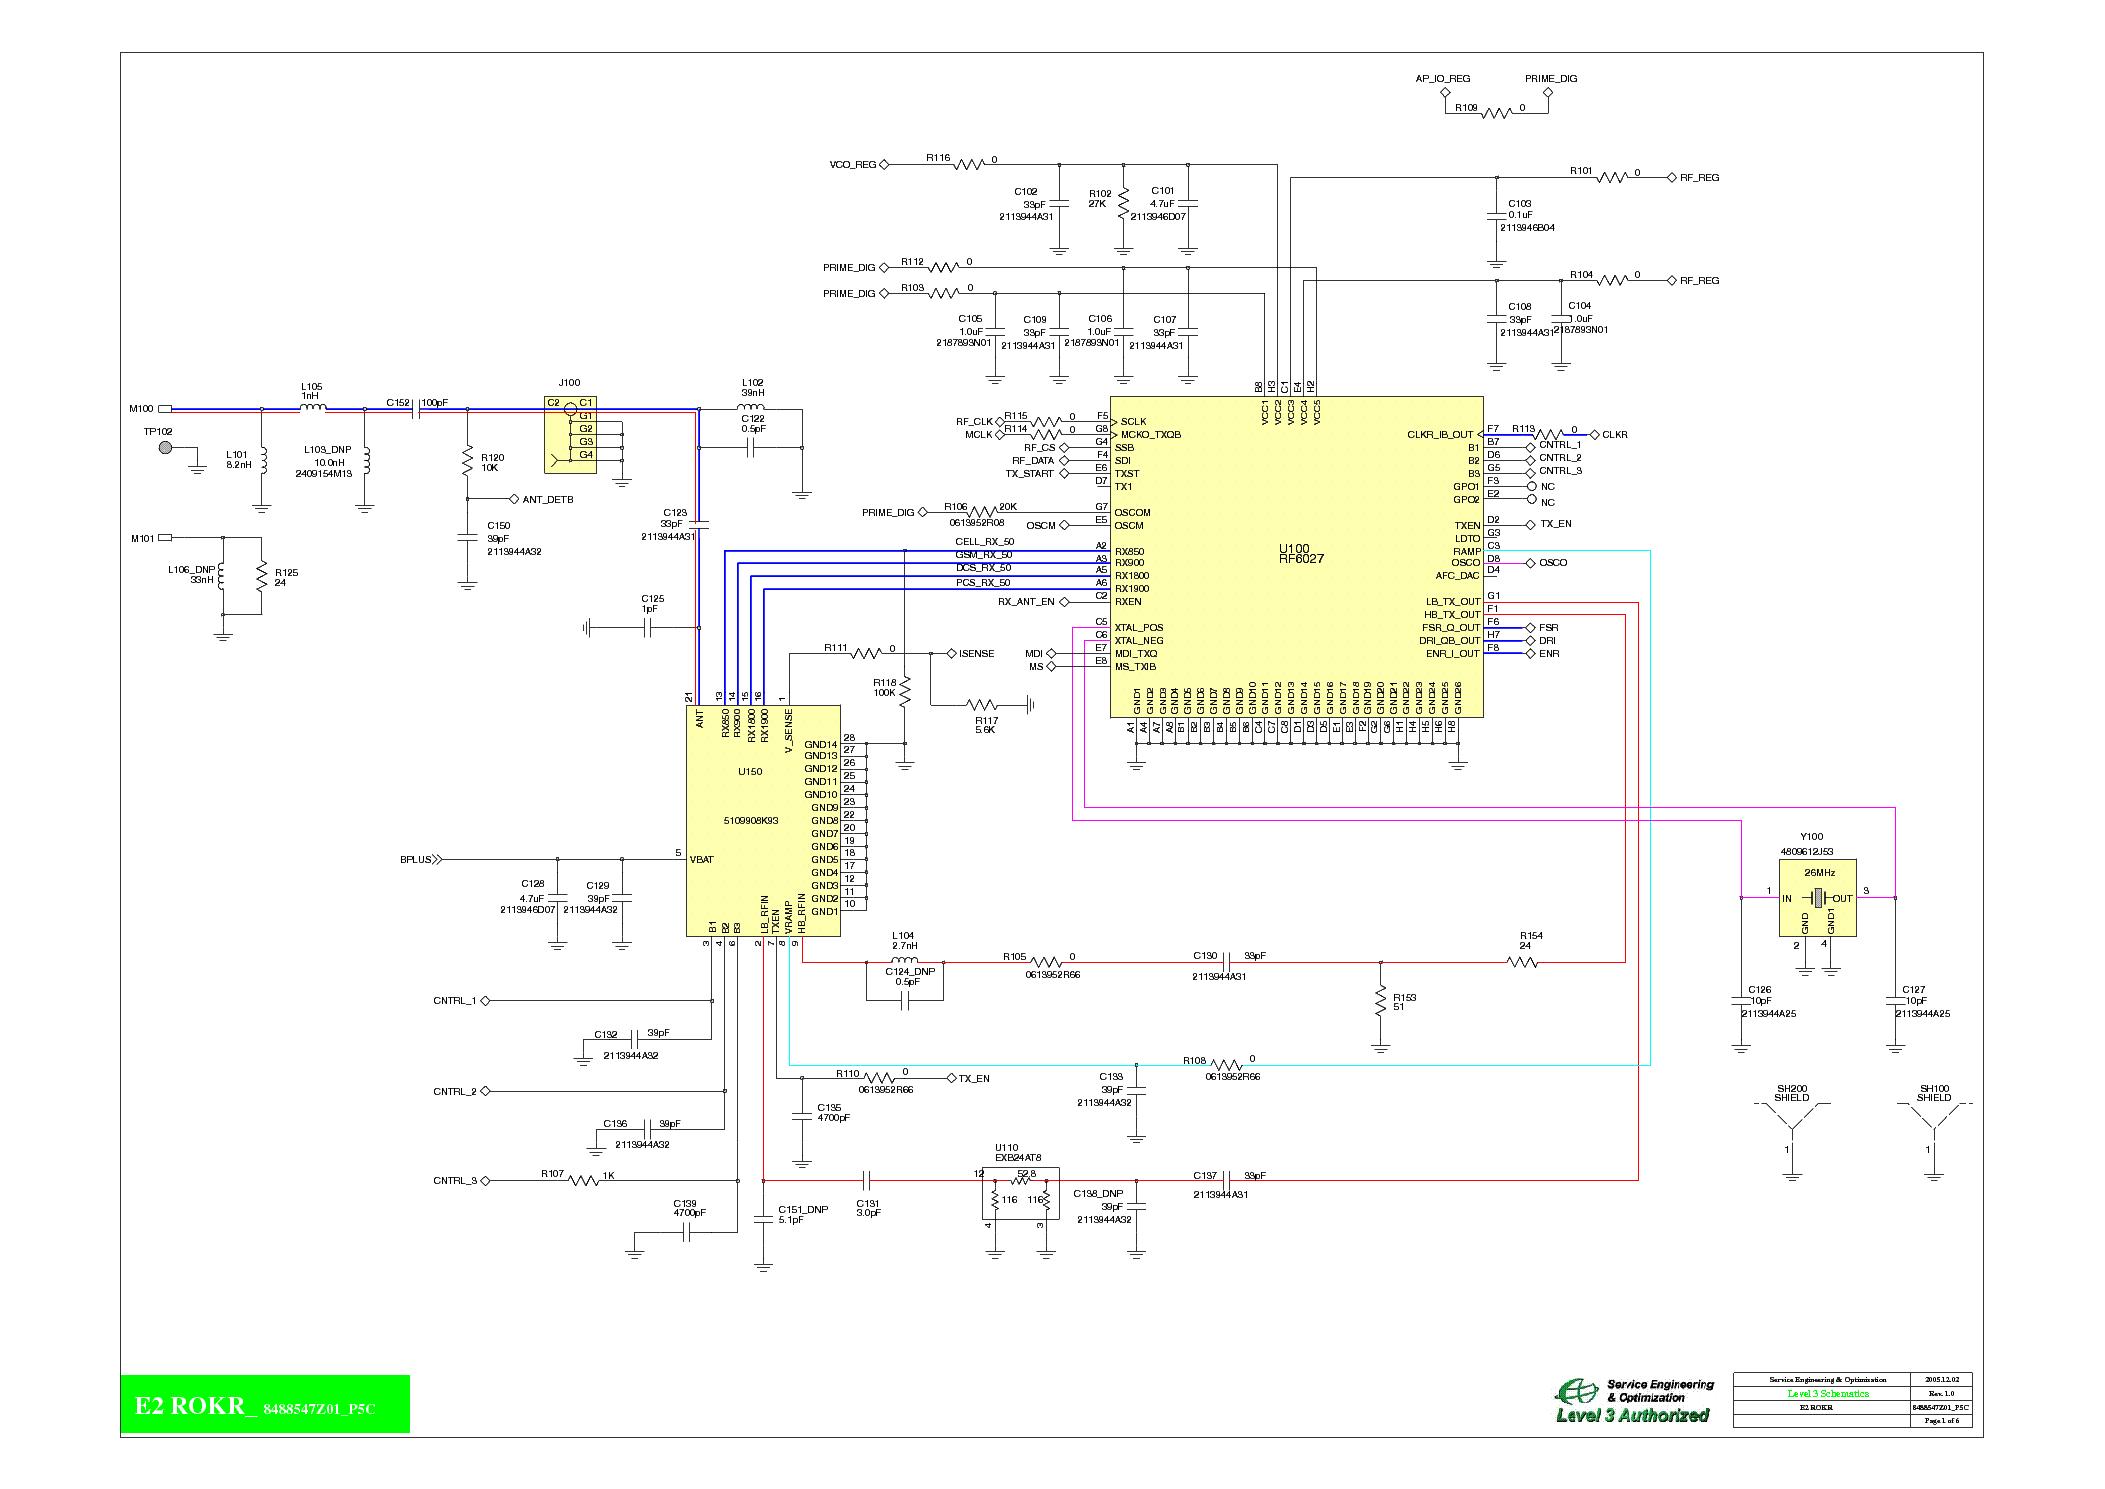 MOTOROLA E2 SCH service manual (1st page)